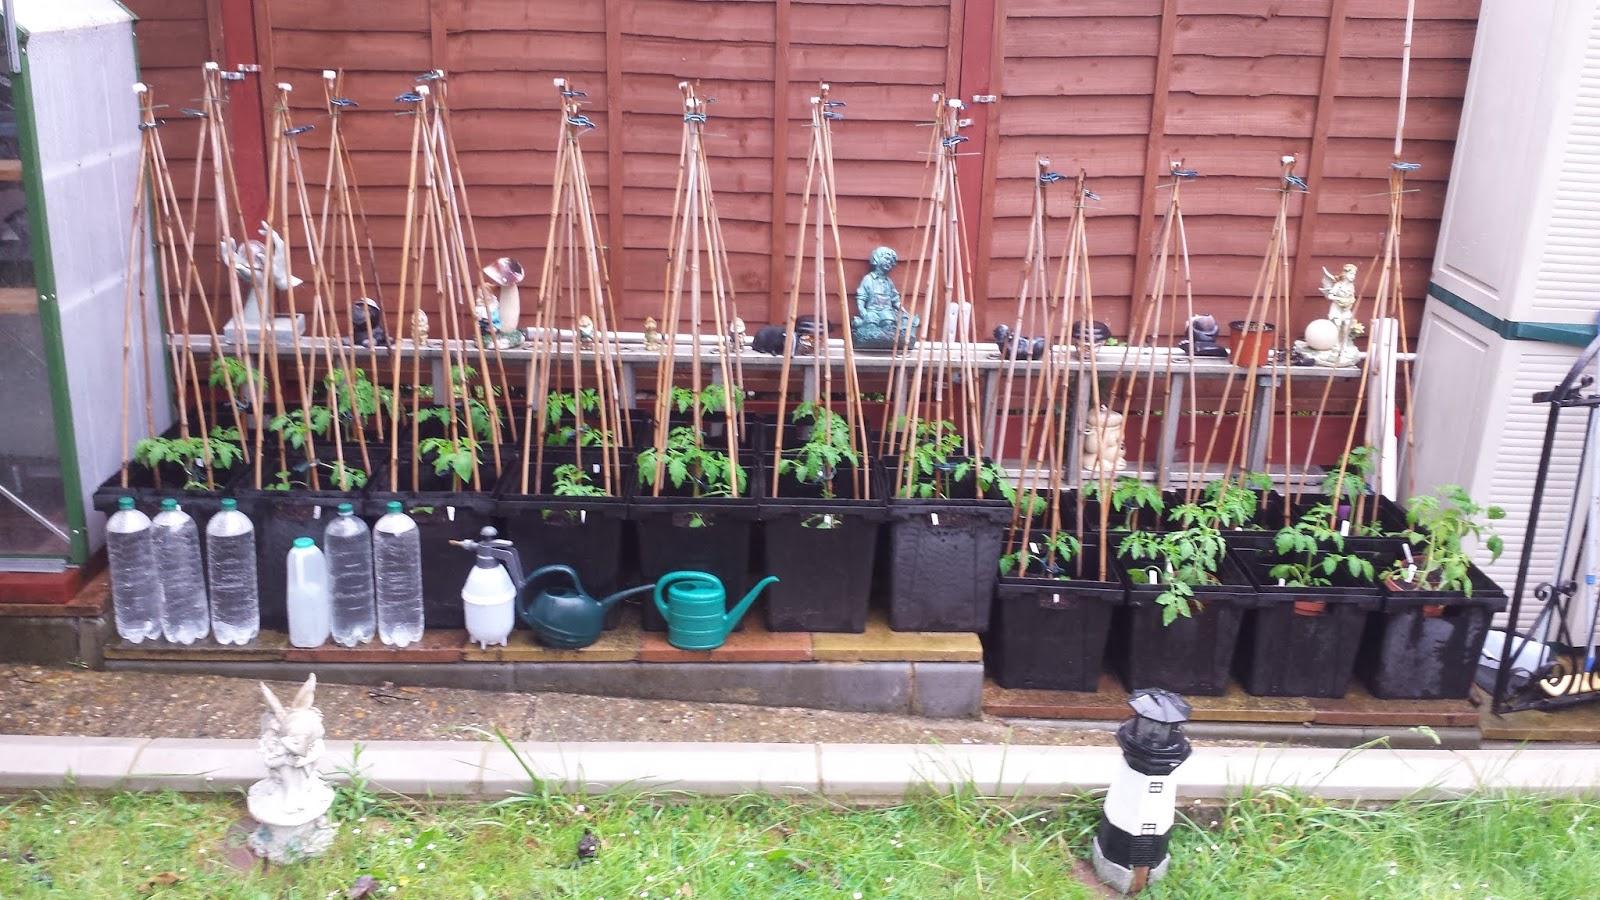 Alans Allotment: Tomato Transplanting